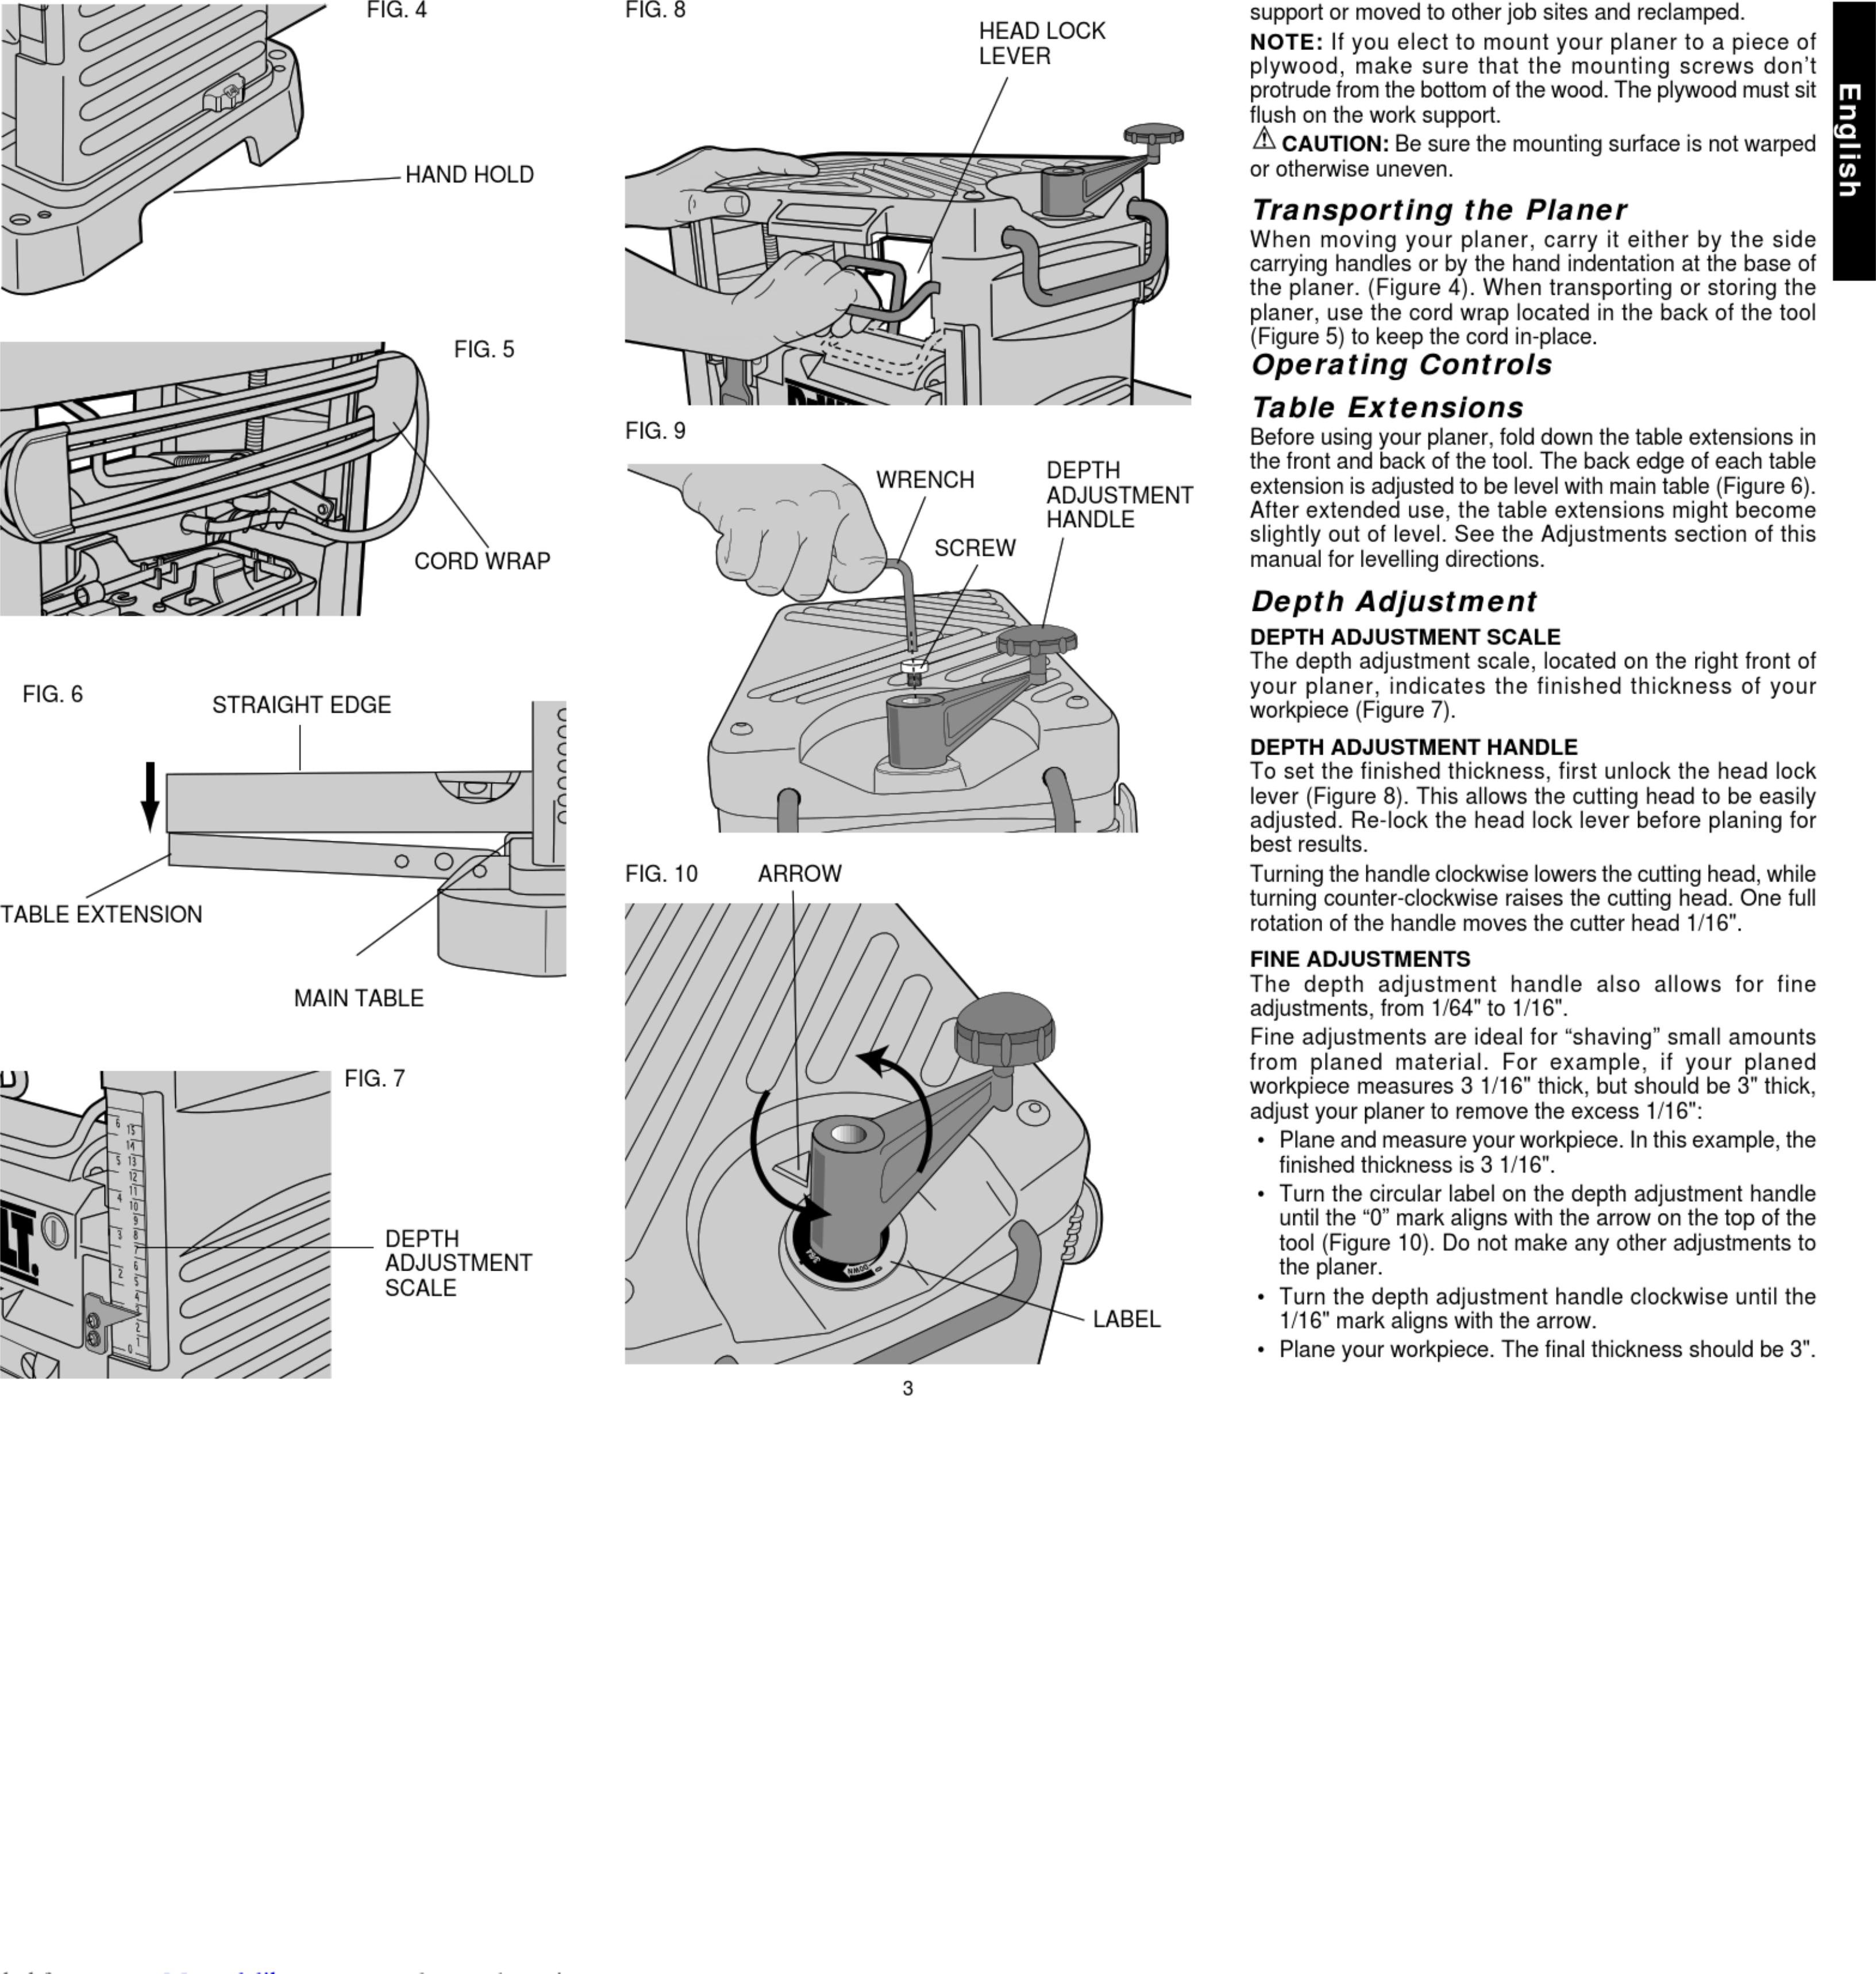 Pettibone model 30 crane operator manual